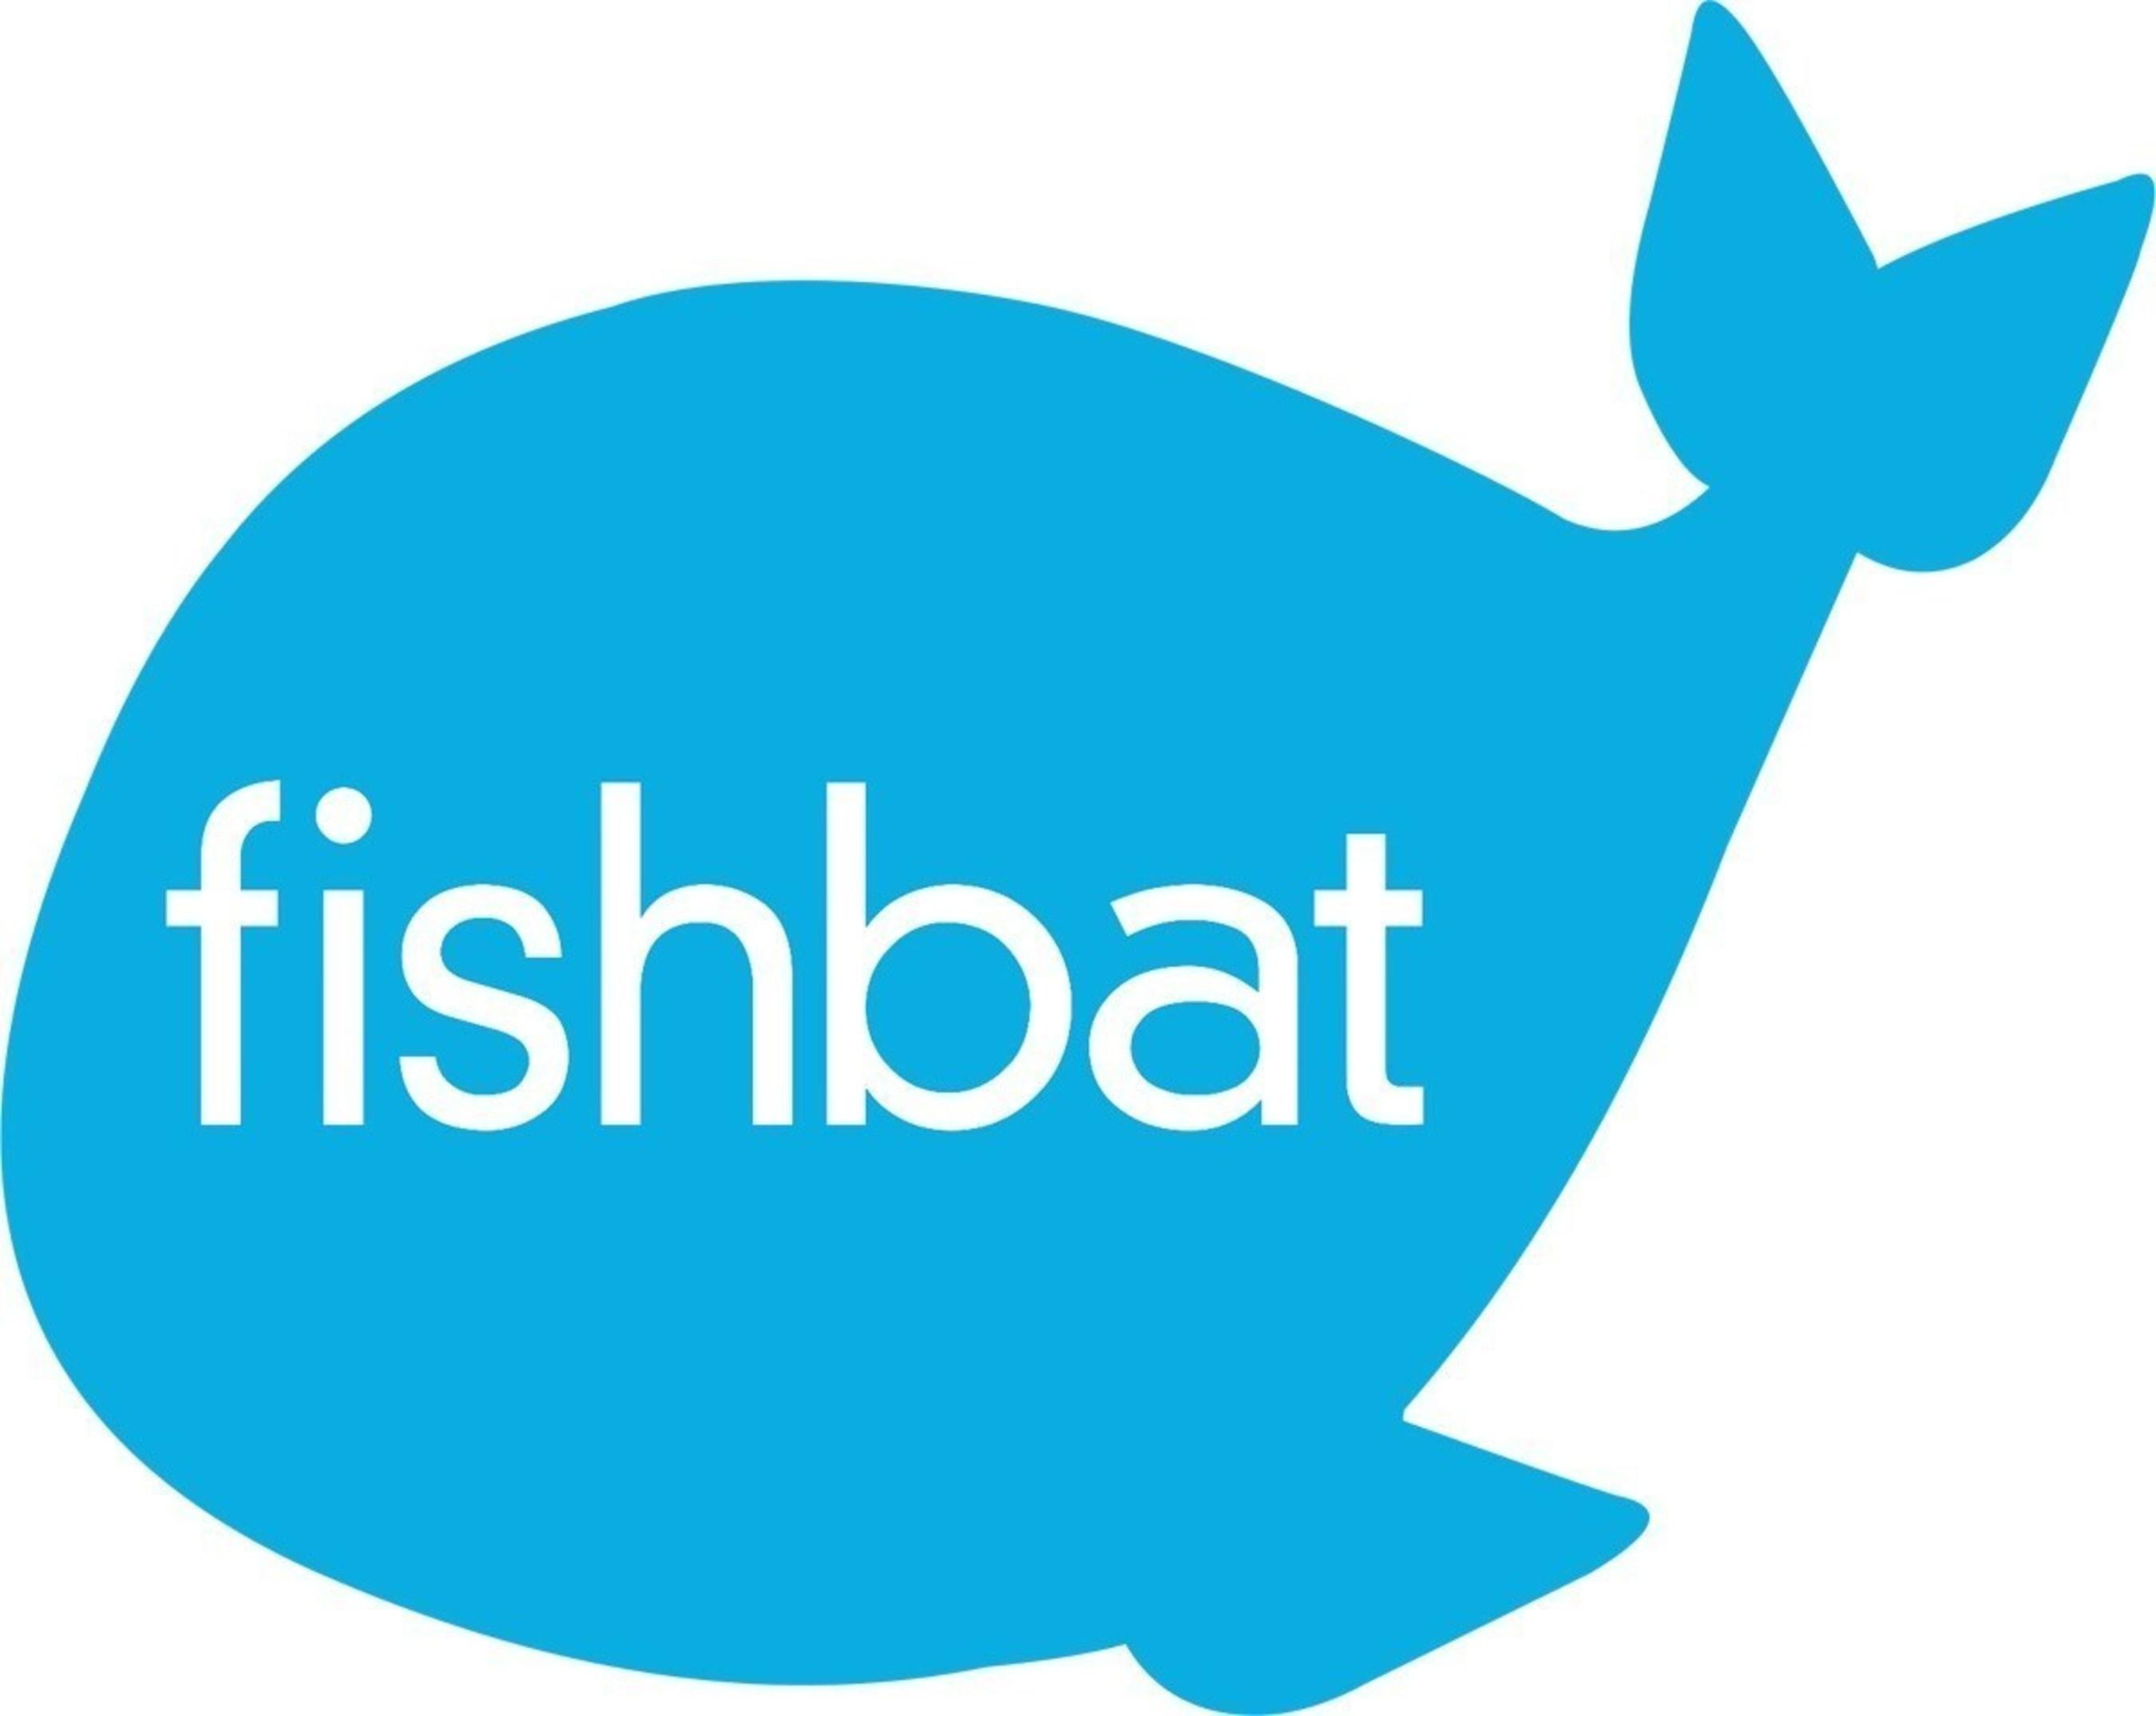 fishbat CEO Clay Darrohn Reveals 4 Reasons to Invest in Social Media Marketing